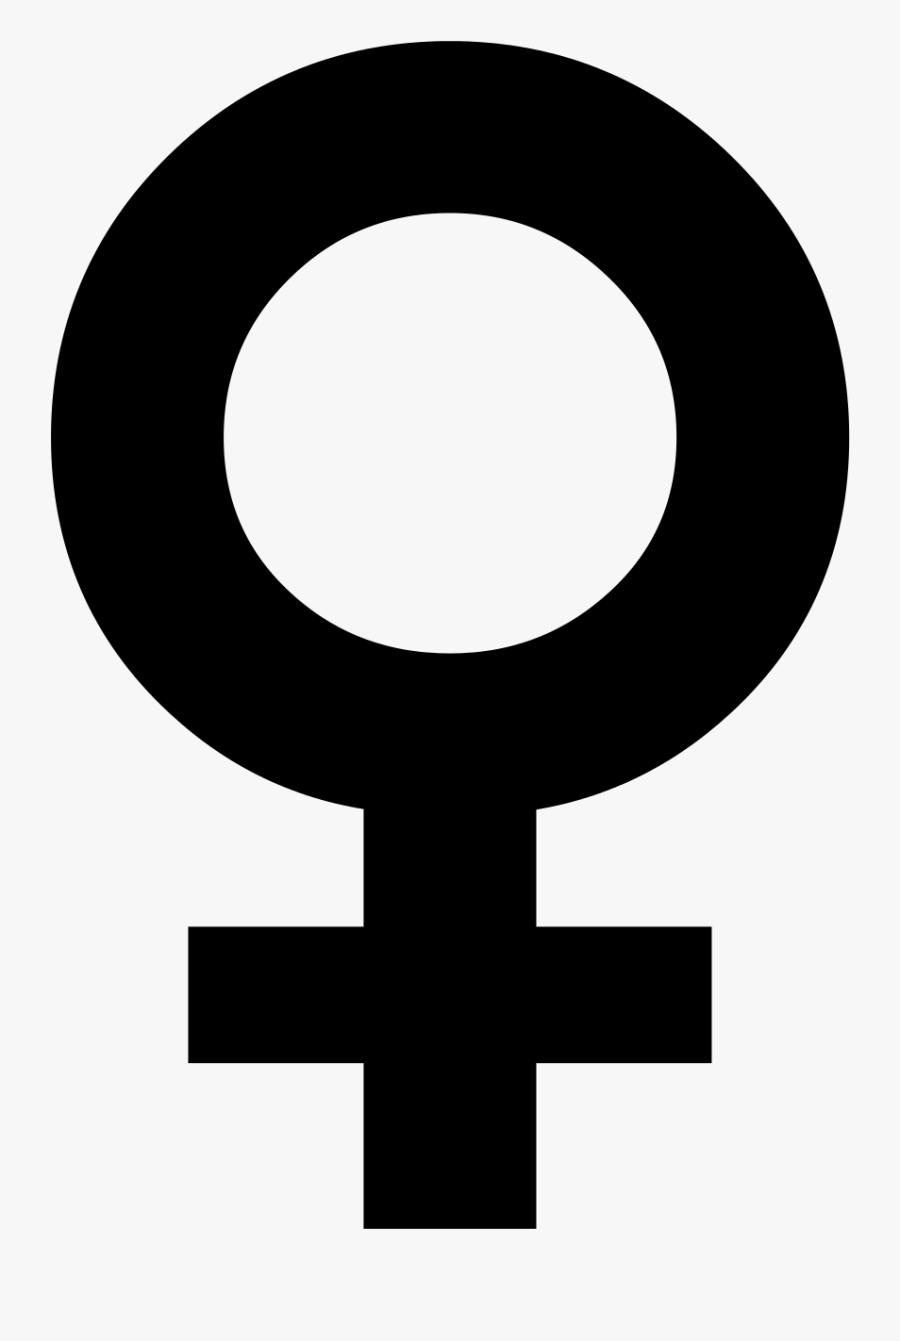 Female Symbol Vector - Female Symbol Png, Transparent Clipart